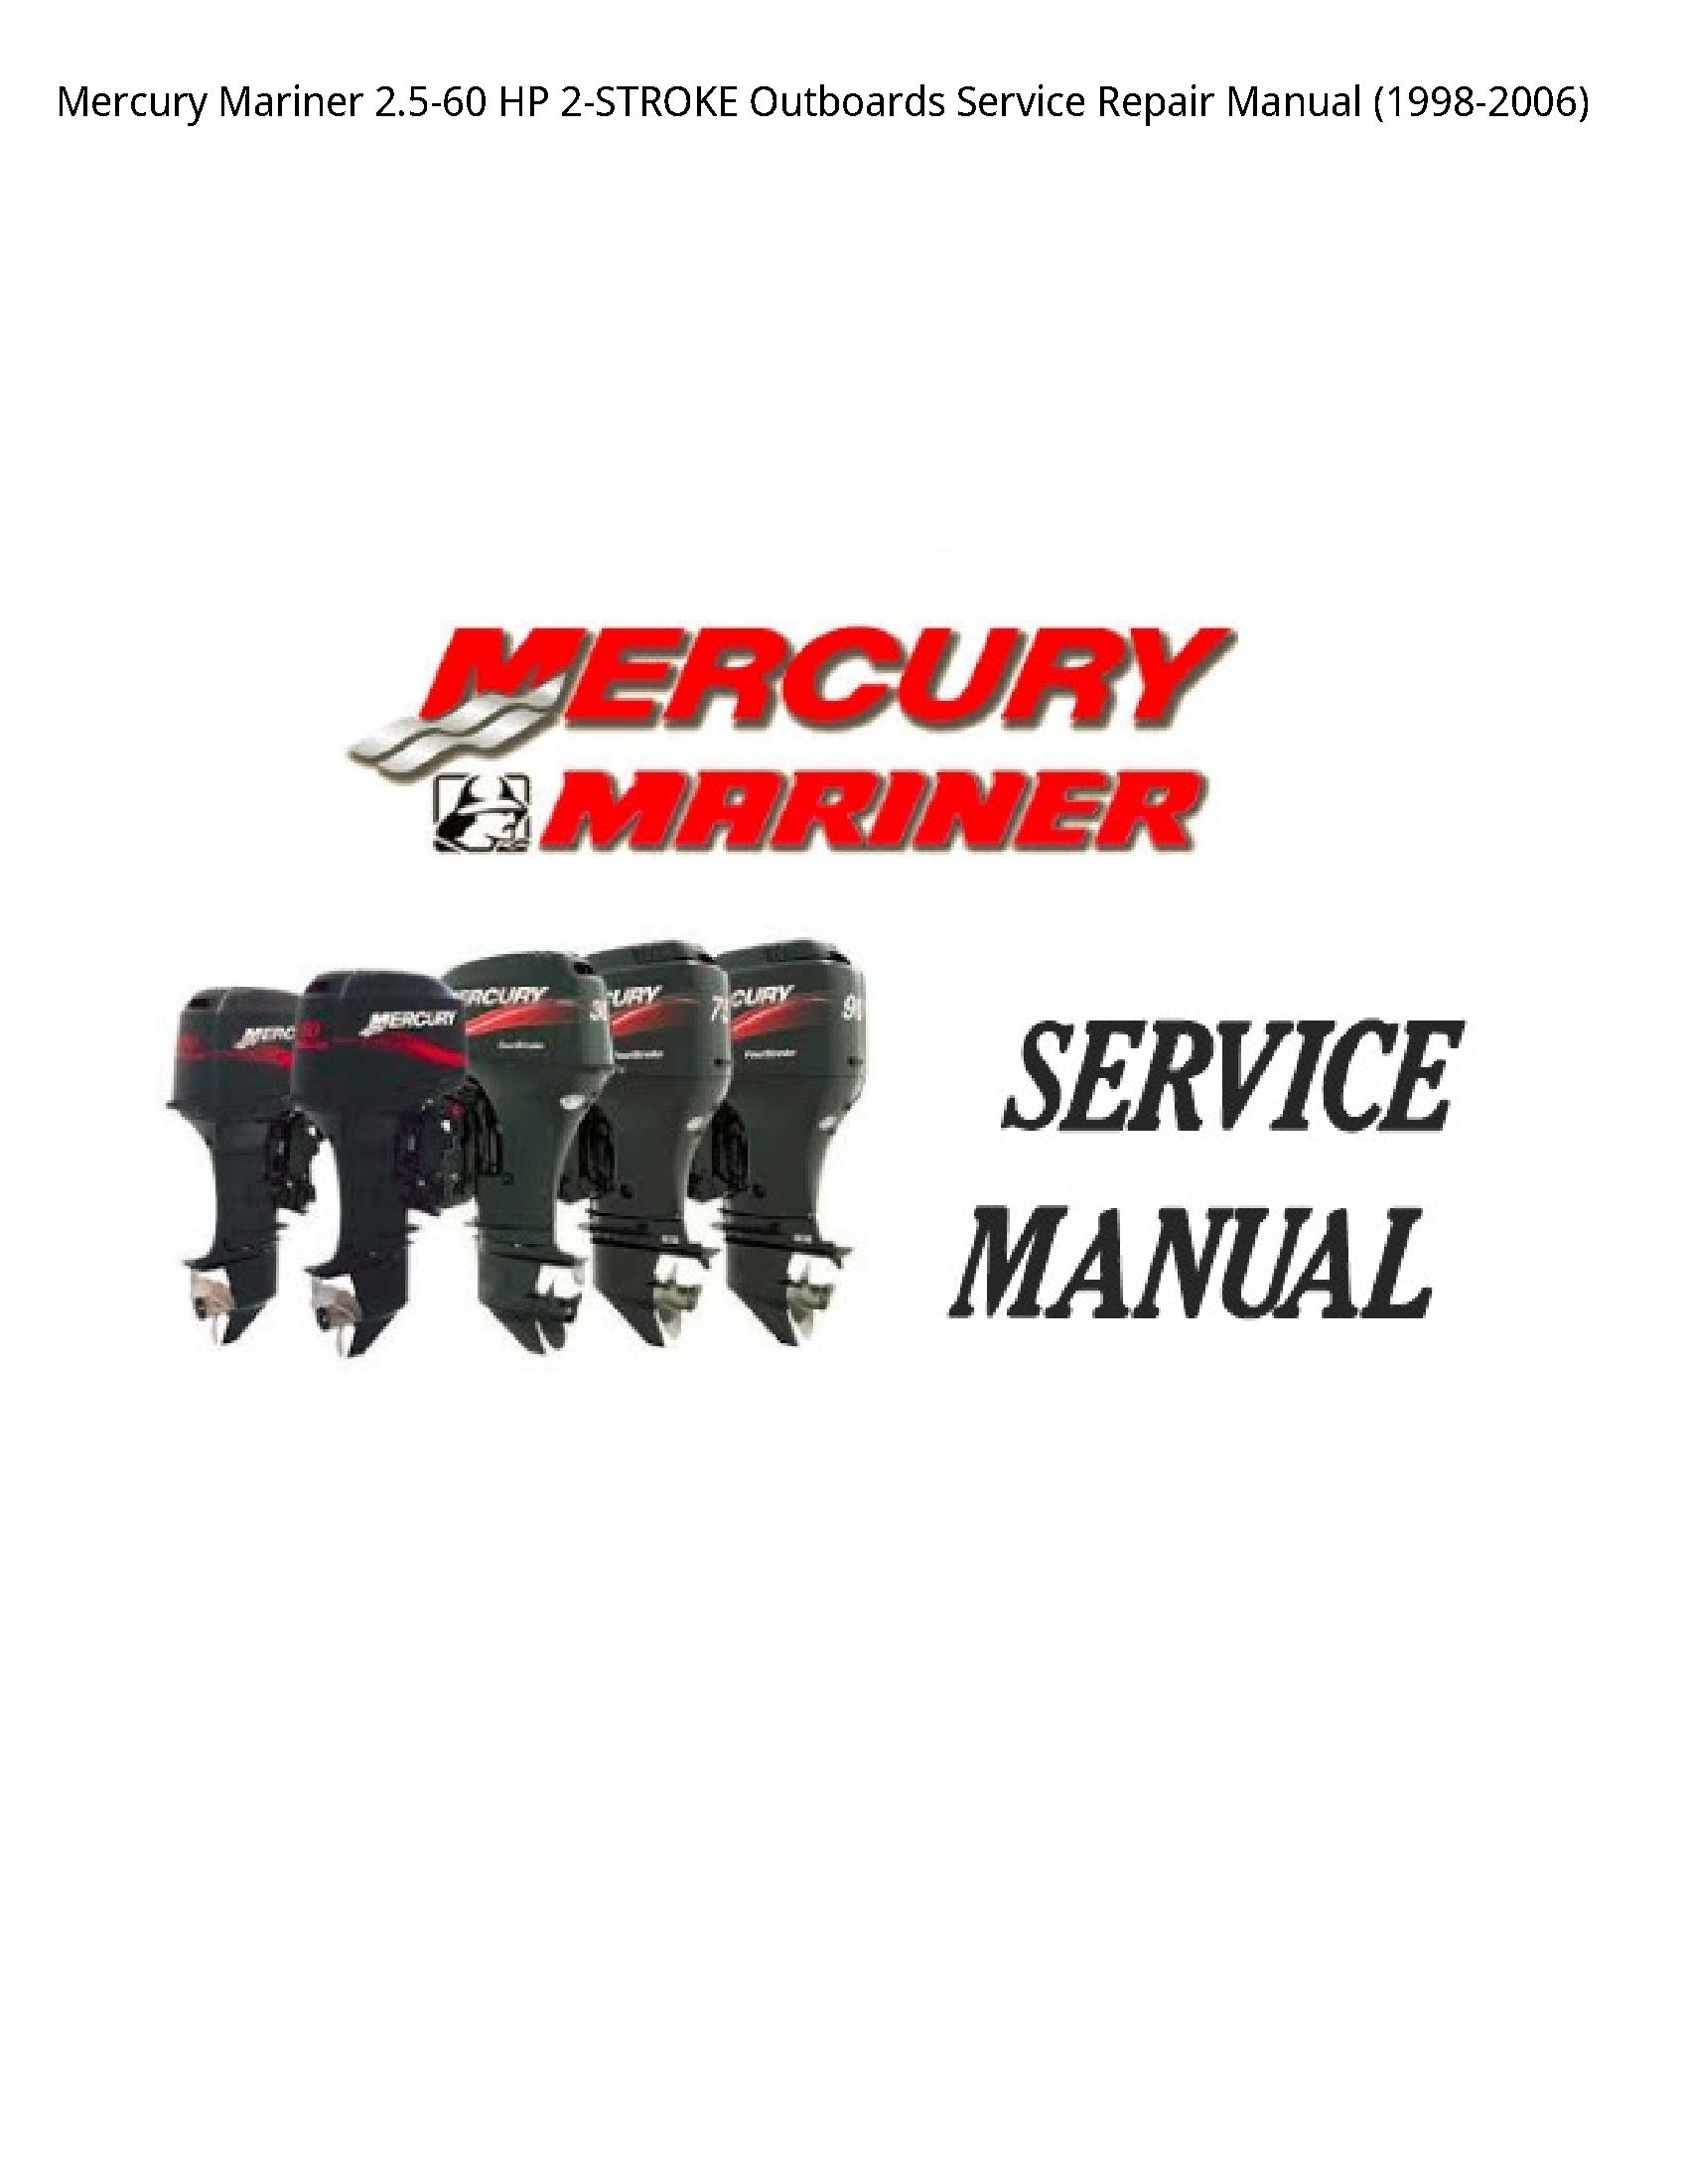 Mercury Mariner 2.5-60 HP Outboards manual